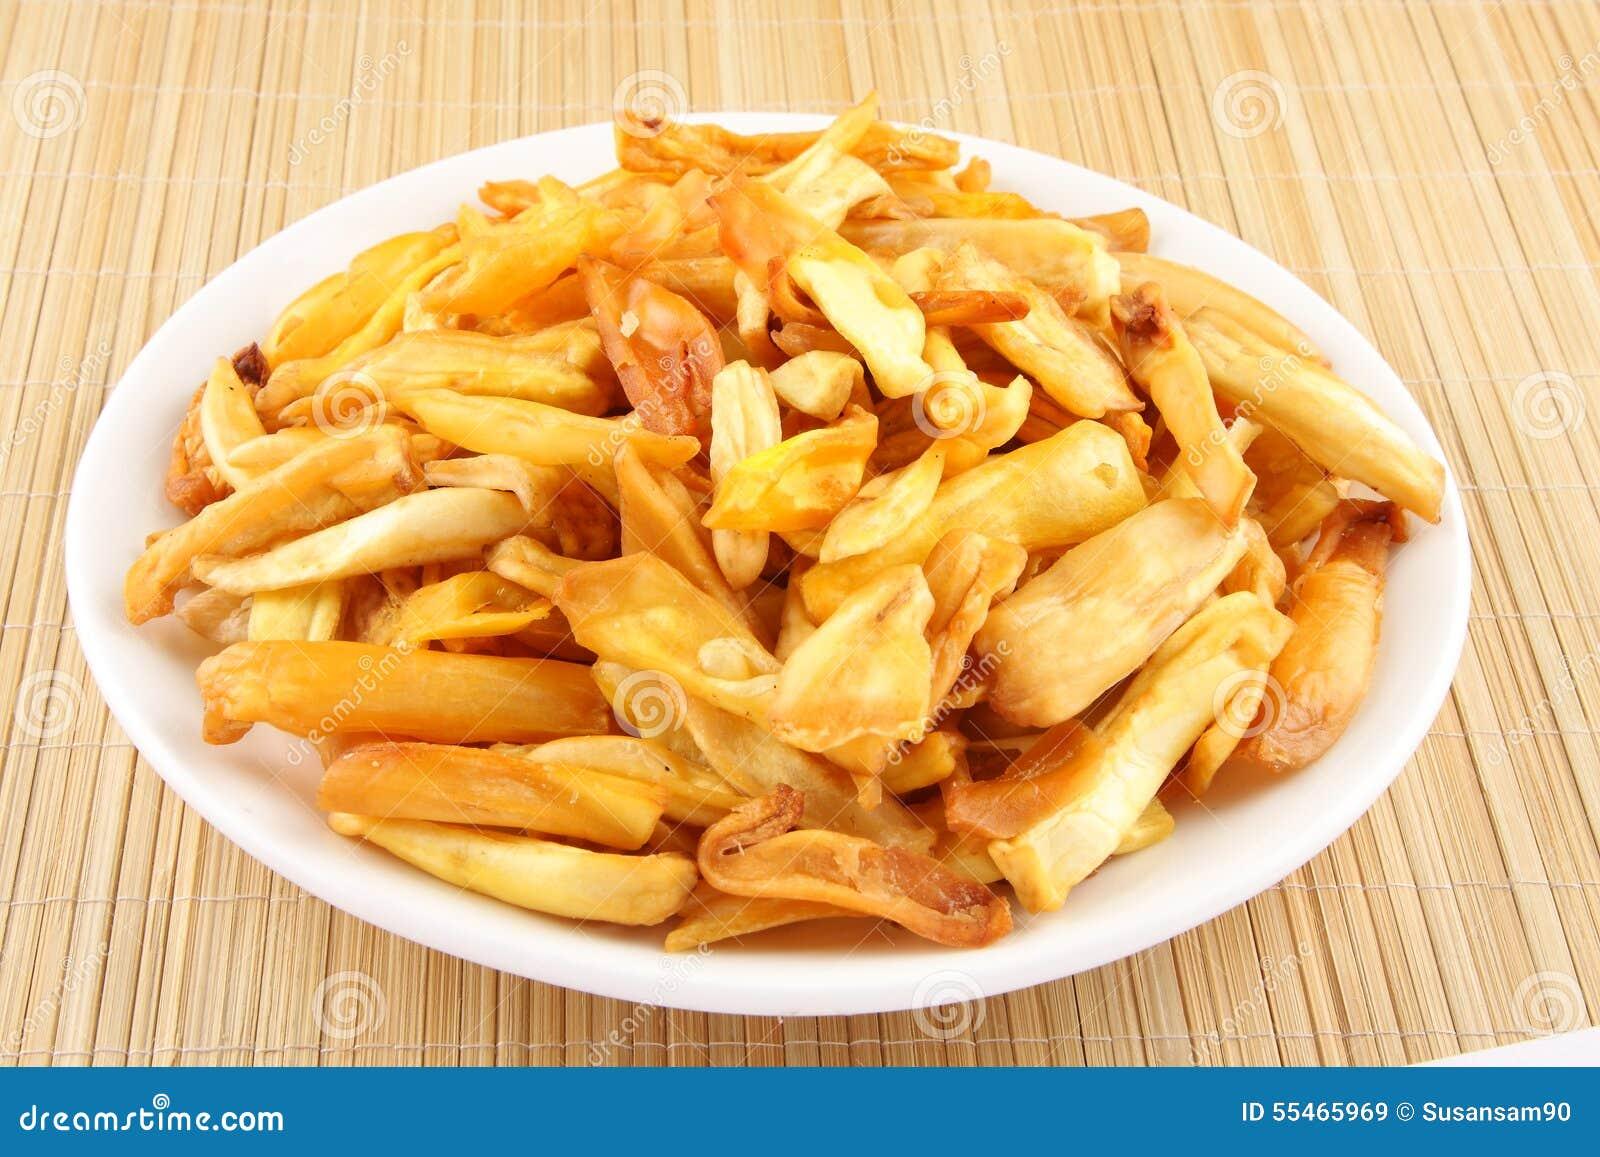 how to make jack fruit chips